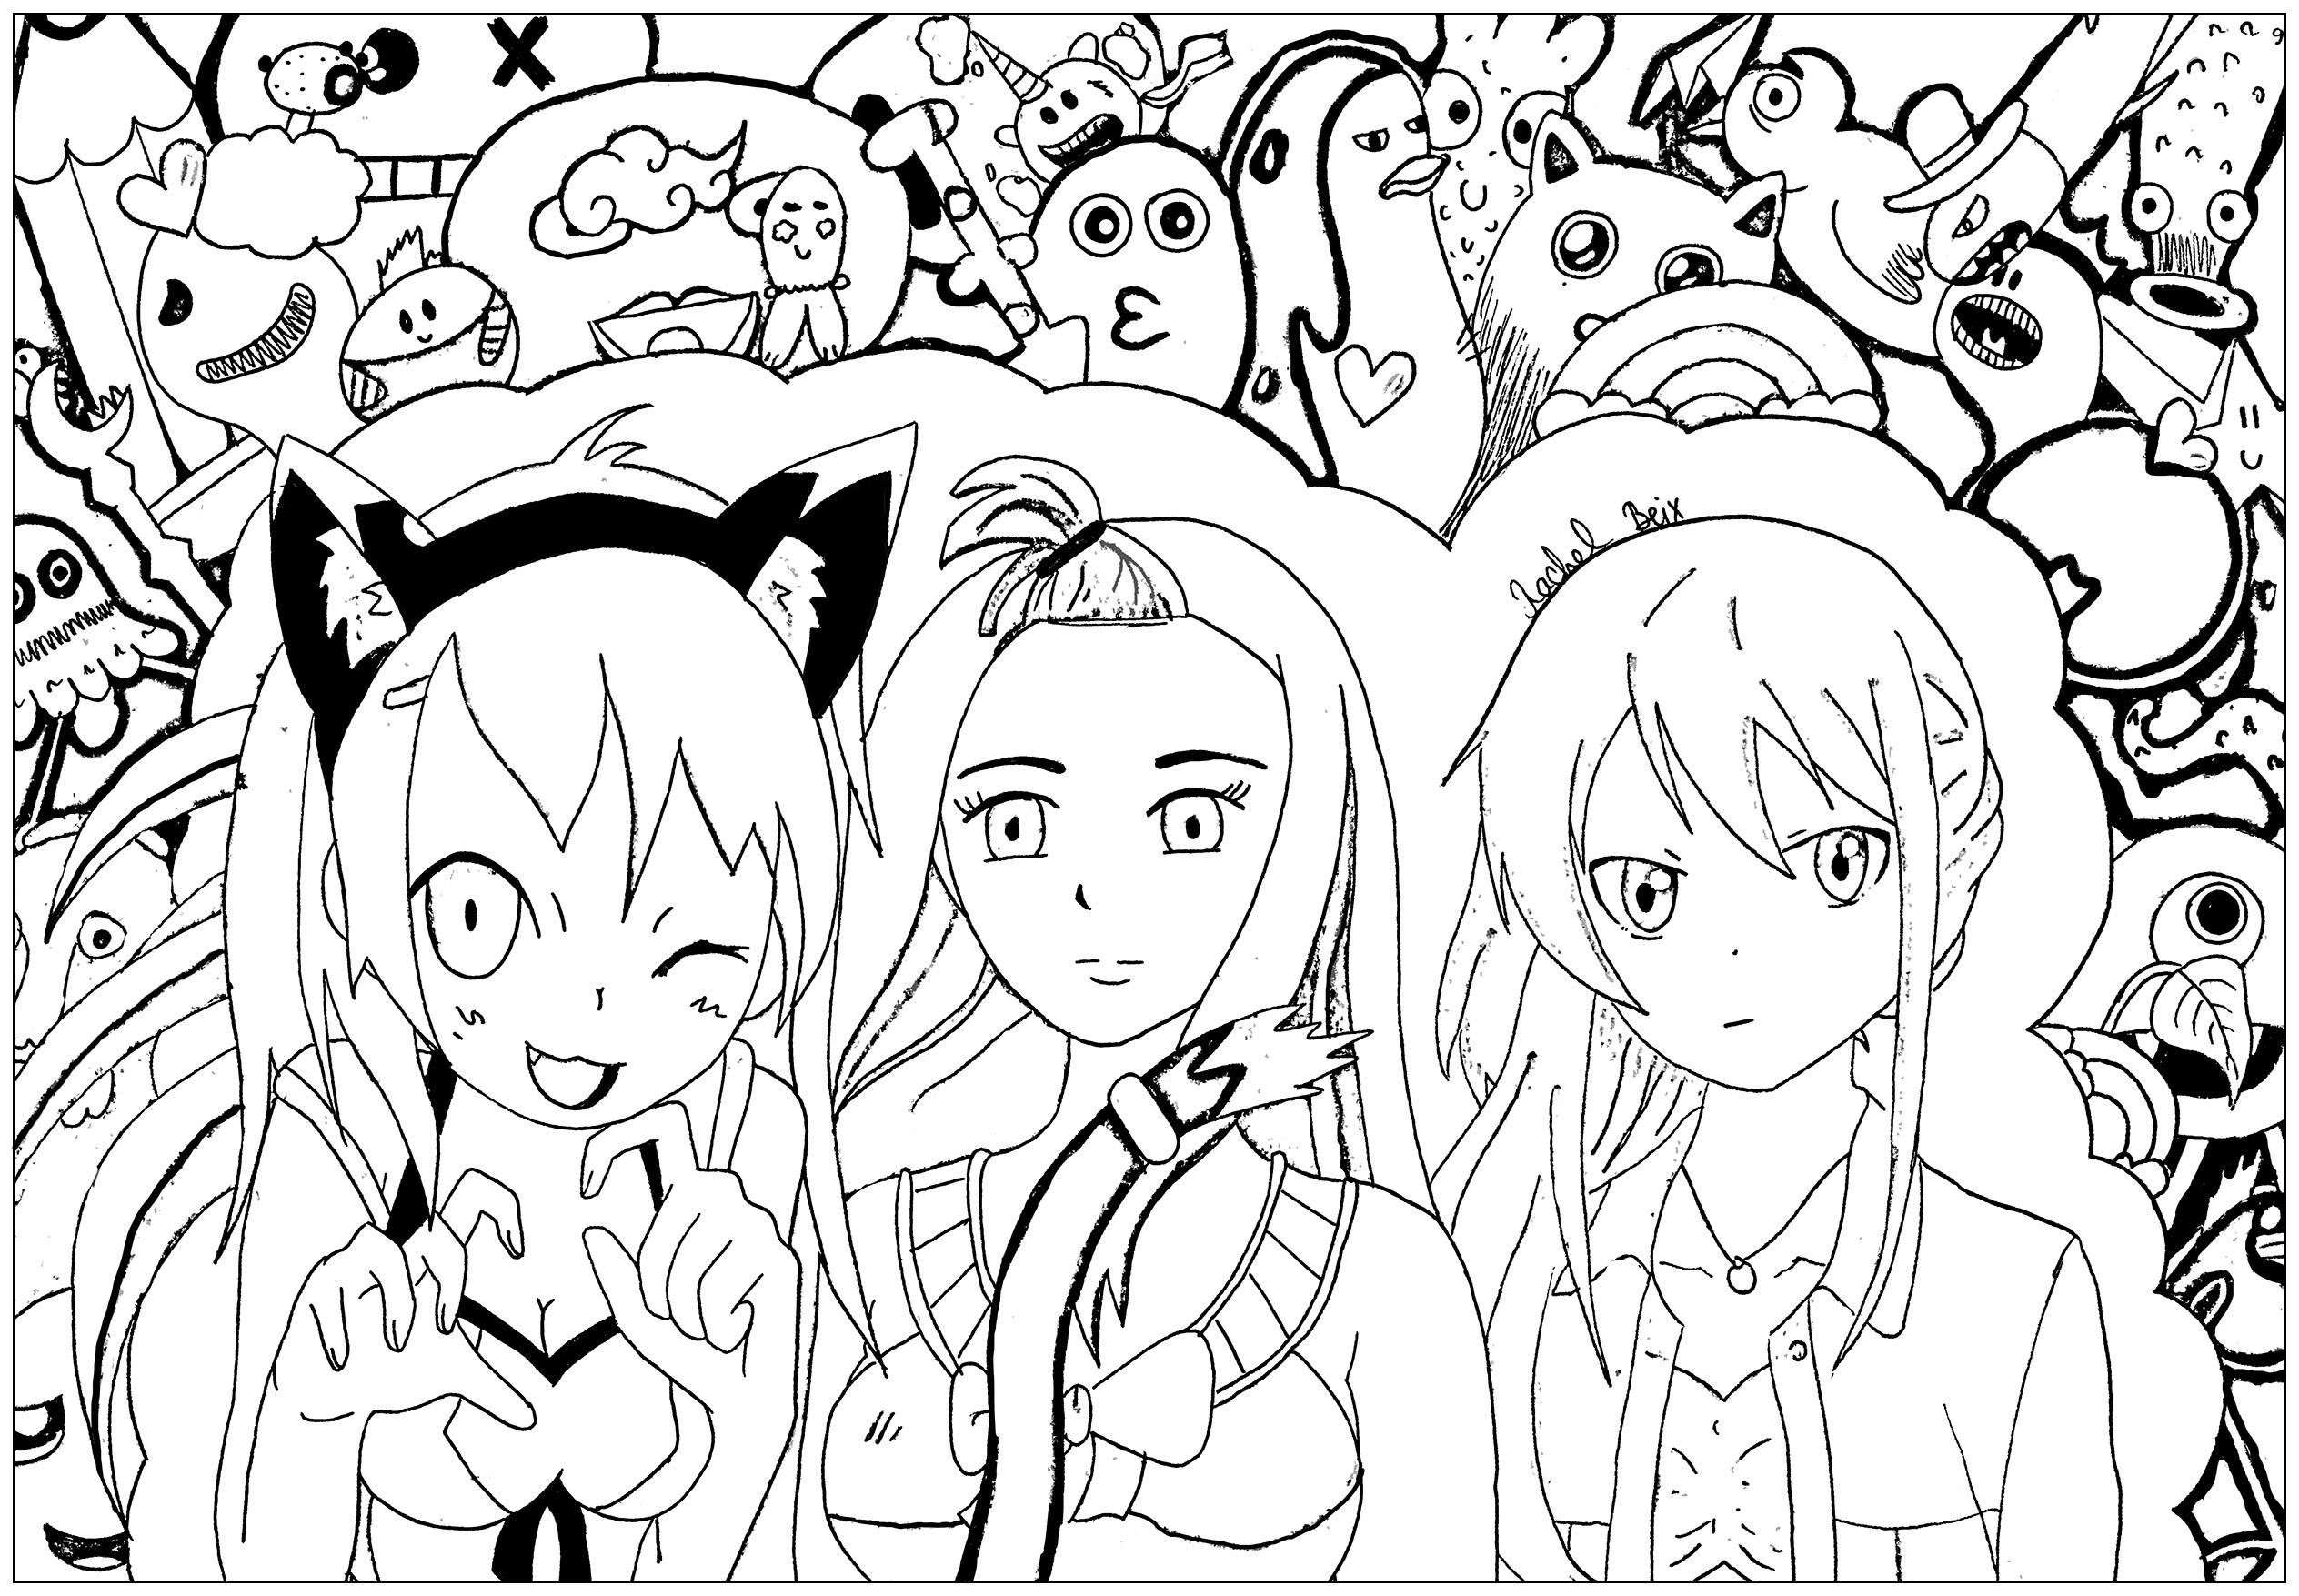 Mangas 19078 Mangas Colorear Para Adultos